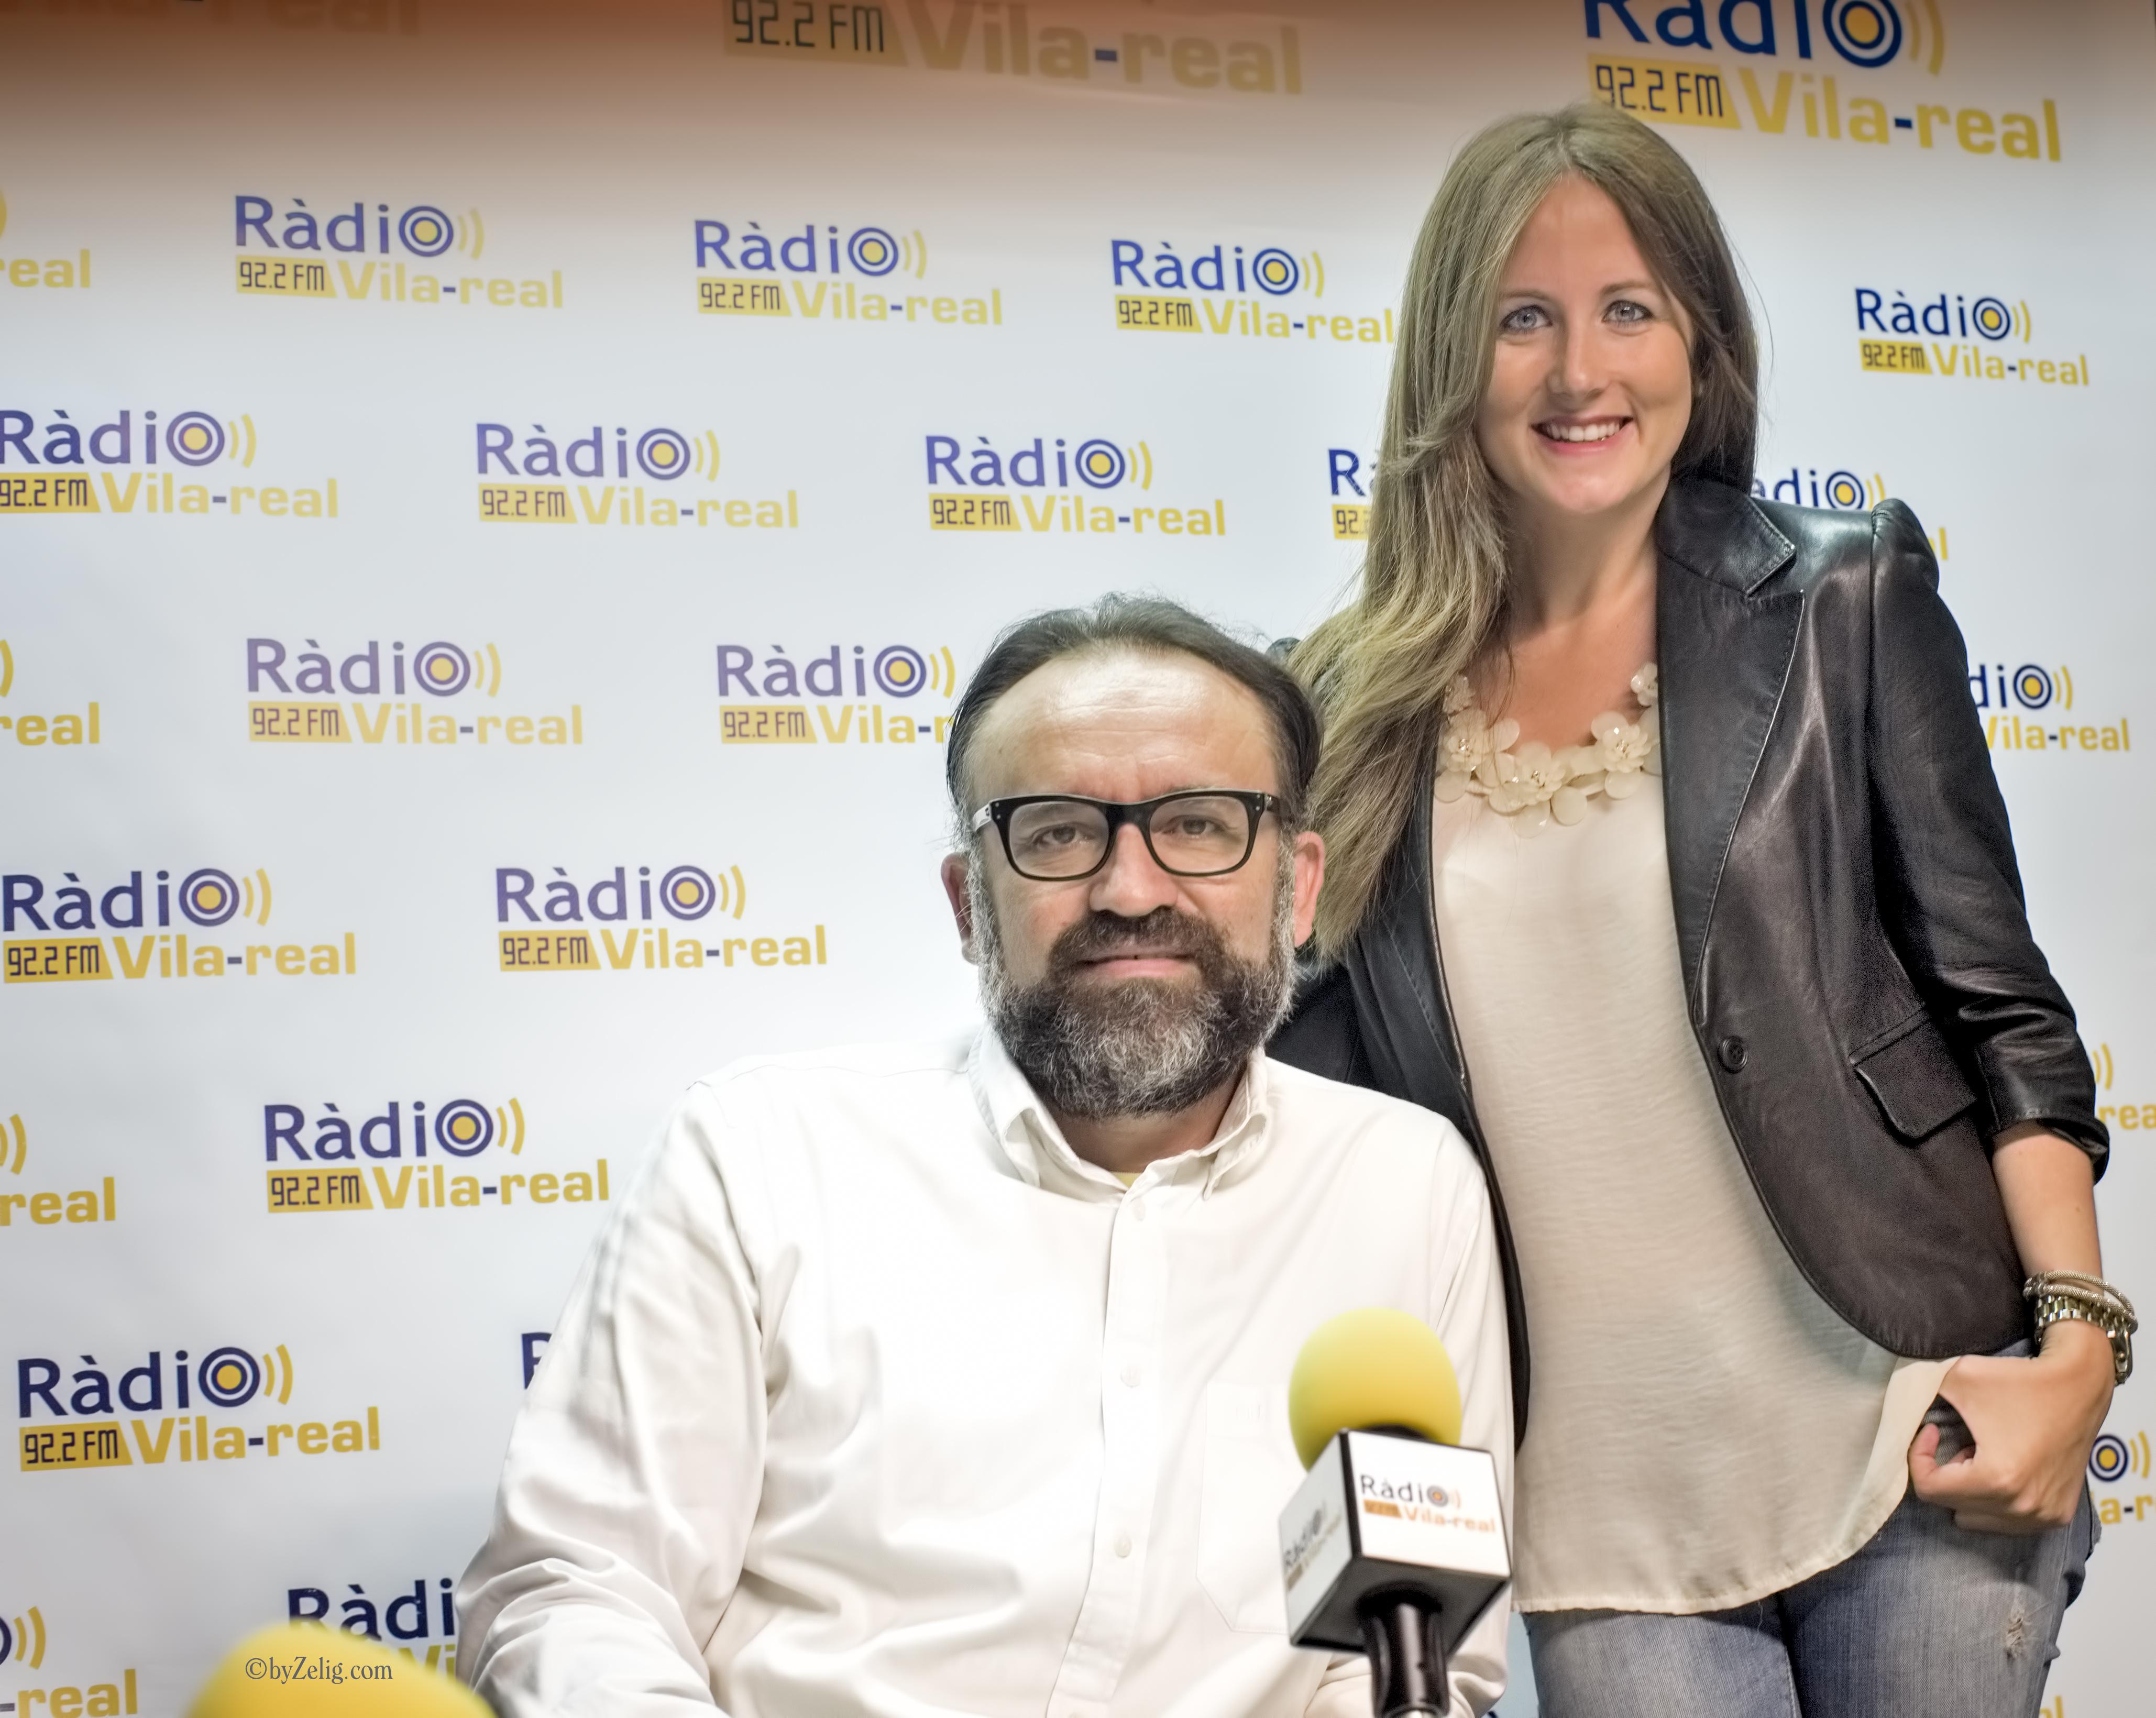 Esports Radio Vila-real. Programa del 1 de febrero de 2017